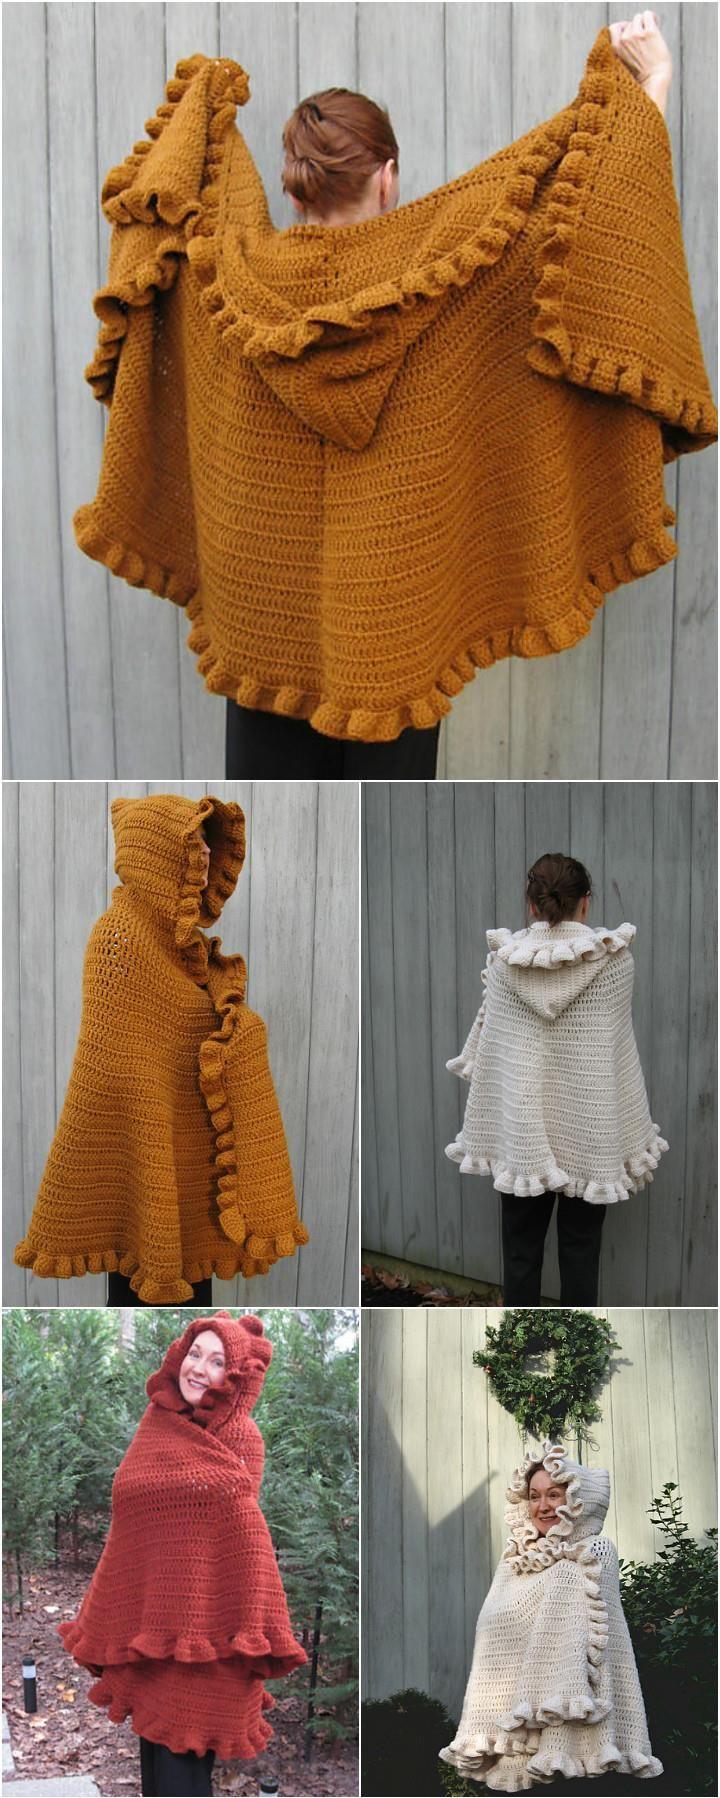 10 FREE Crochet Shawl Patterns for Women\'s | Ponchos, Tejido y Chal